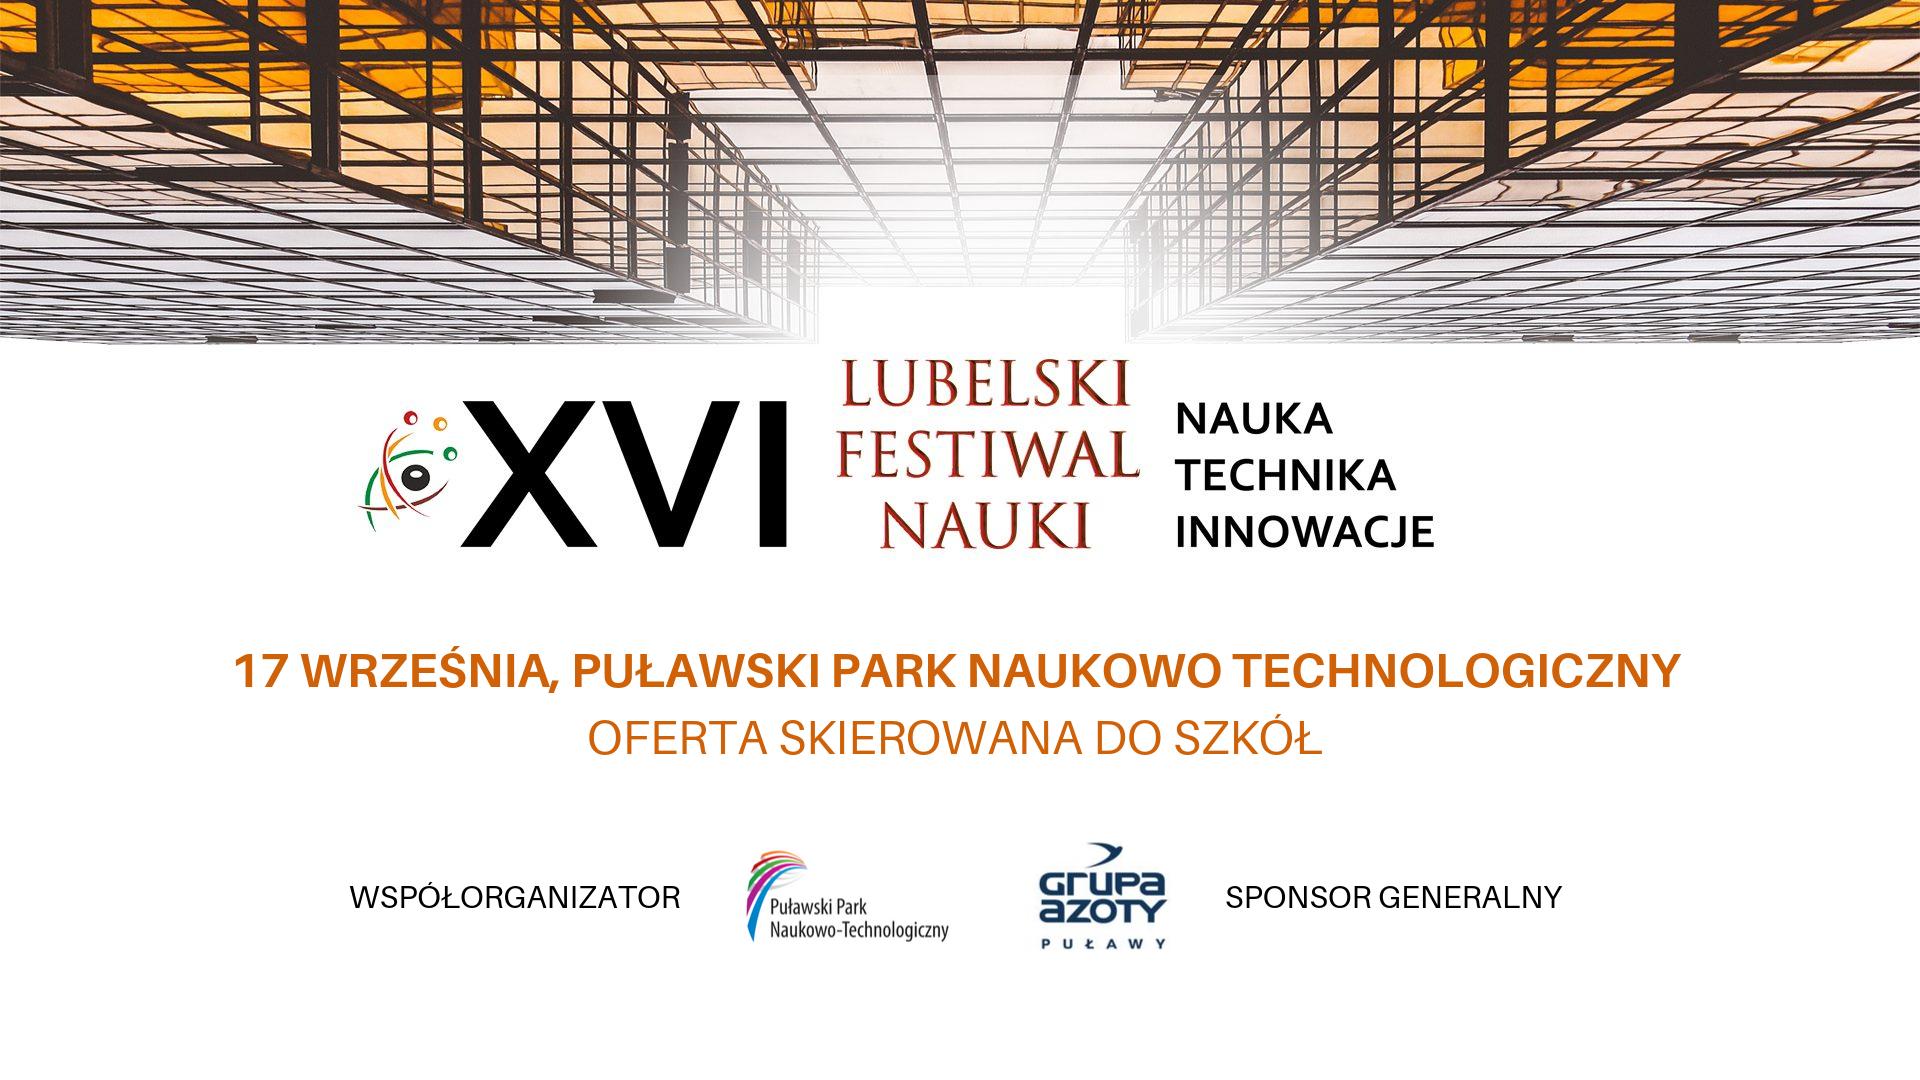 Ekran_lubelski_festiwal_nauki_2019_poziom